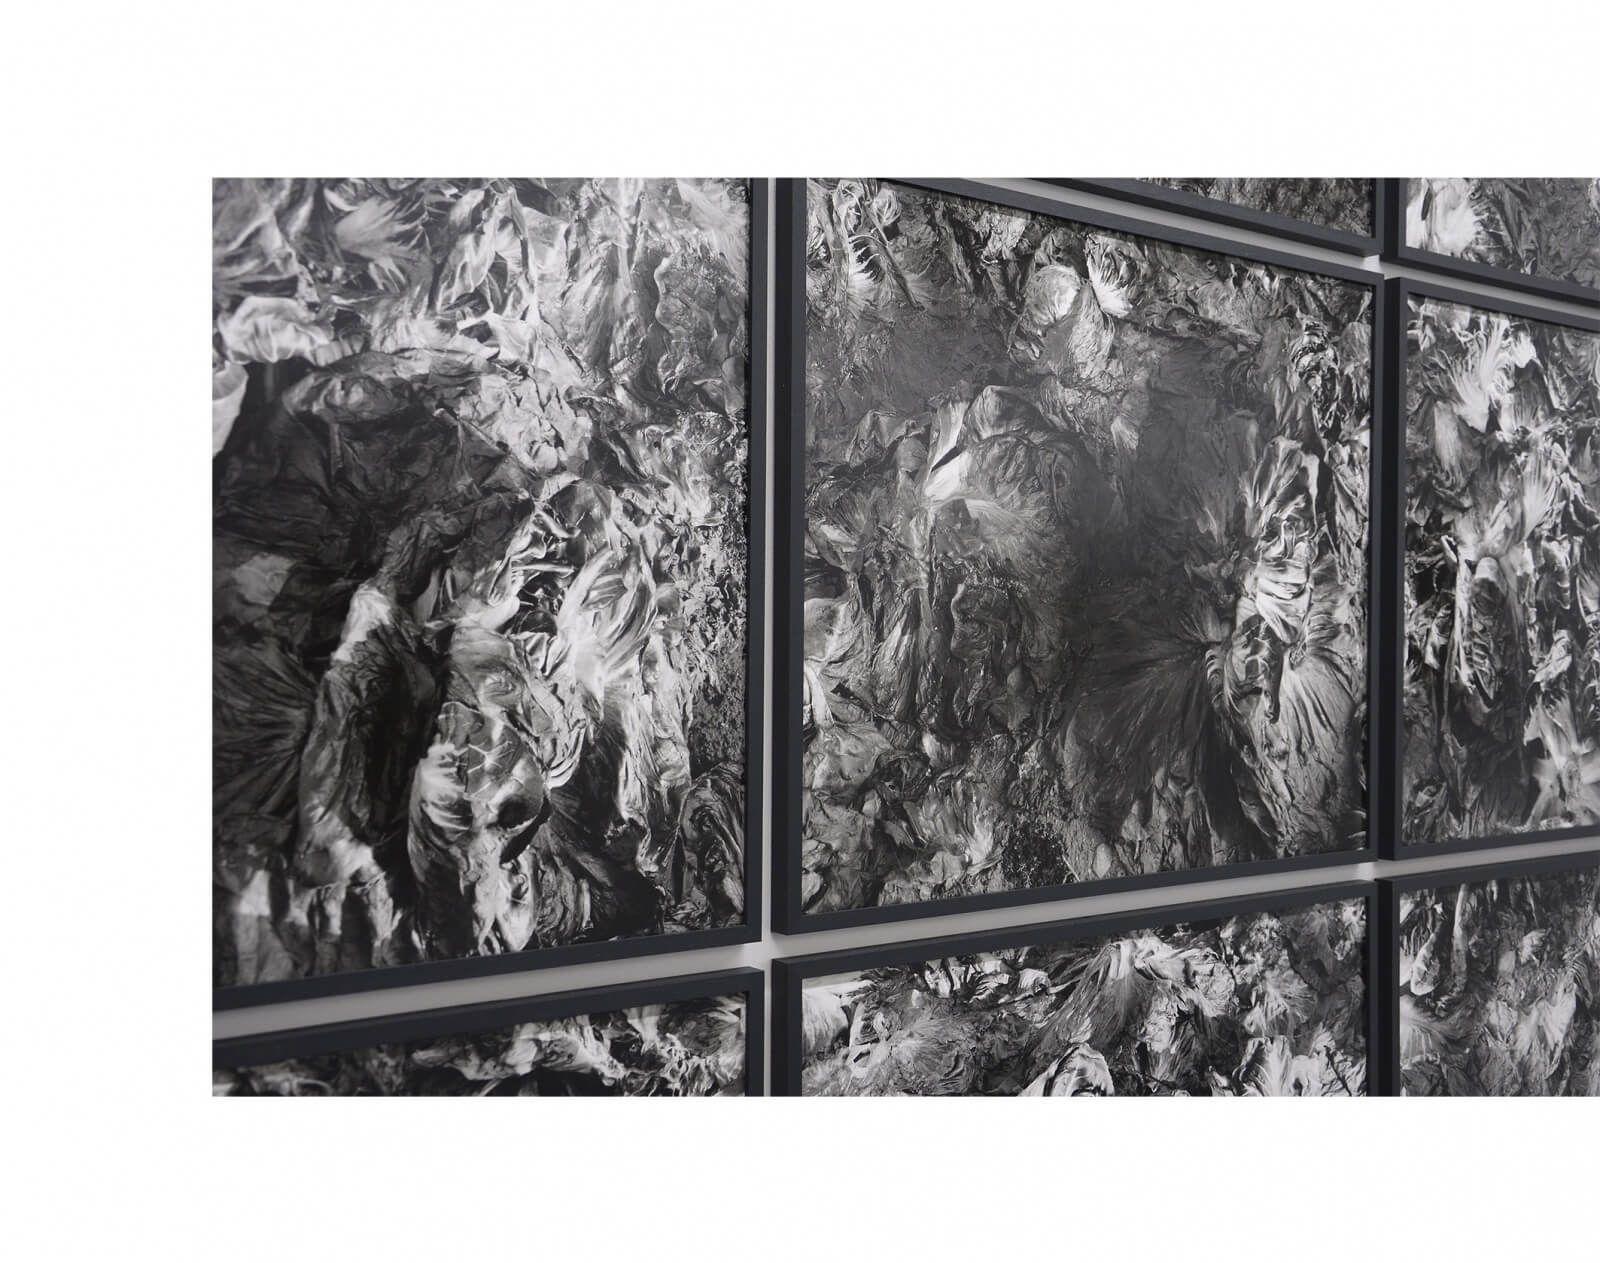 "<p>""Neun Bilder""<br /> January 10th – February 28th<br /> Galerie de Roussan, Paris<br /> <a href=""http://www.galeriederoussan.com"" target=""_blank"">www.galeriederoussan.com</a></p> <p></p> <p>Radicchio Rosso I-IX (detail)<br /> nine gelatin silver prints<br /> 54,5 x 62 cm each</p>"